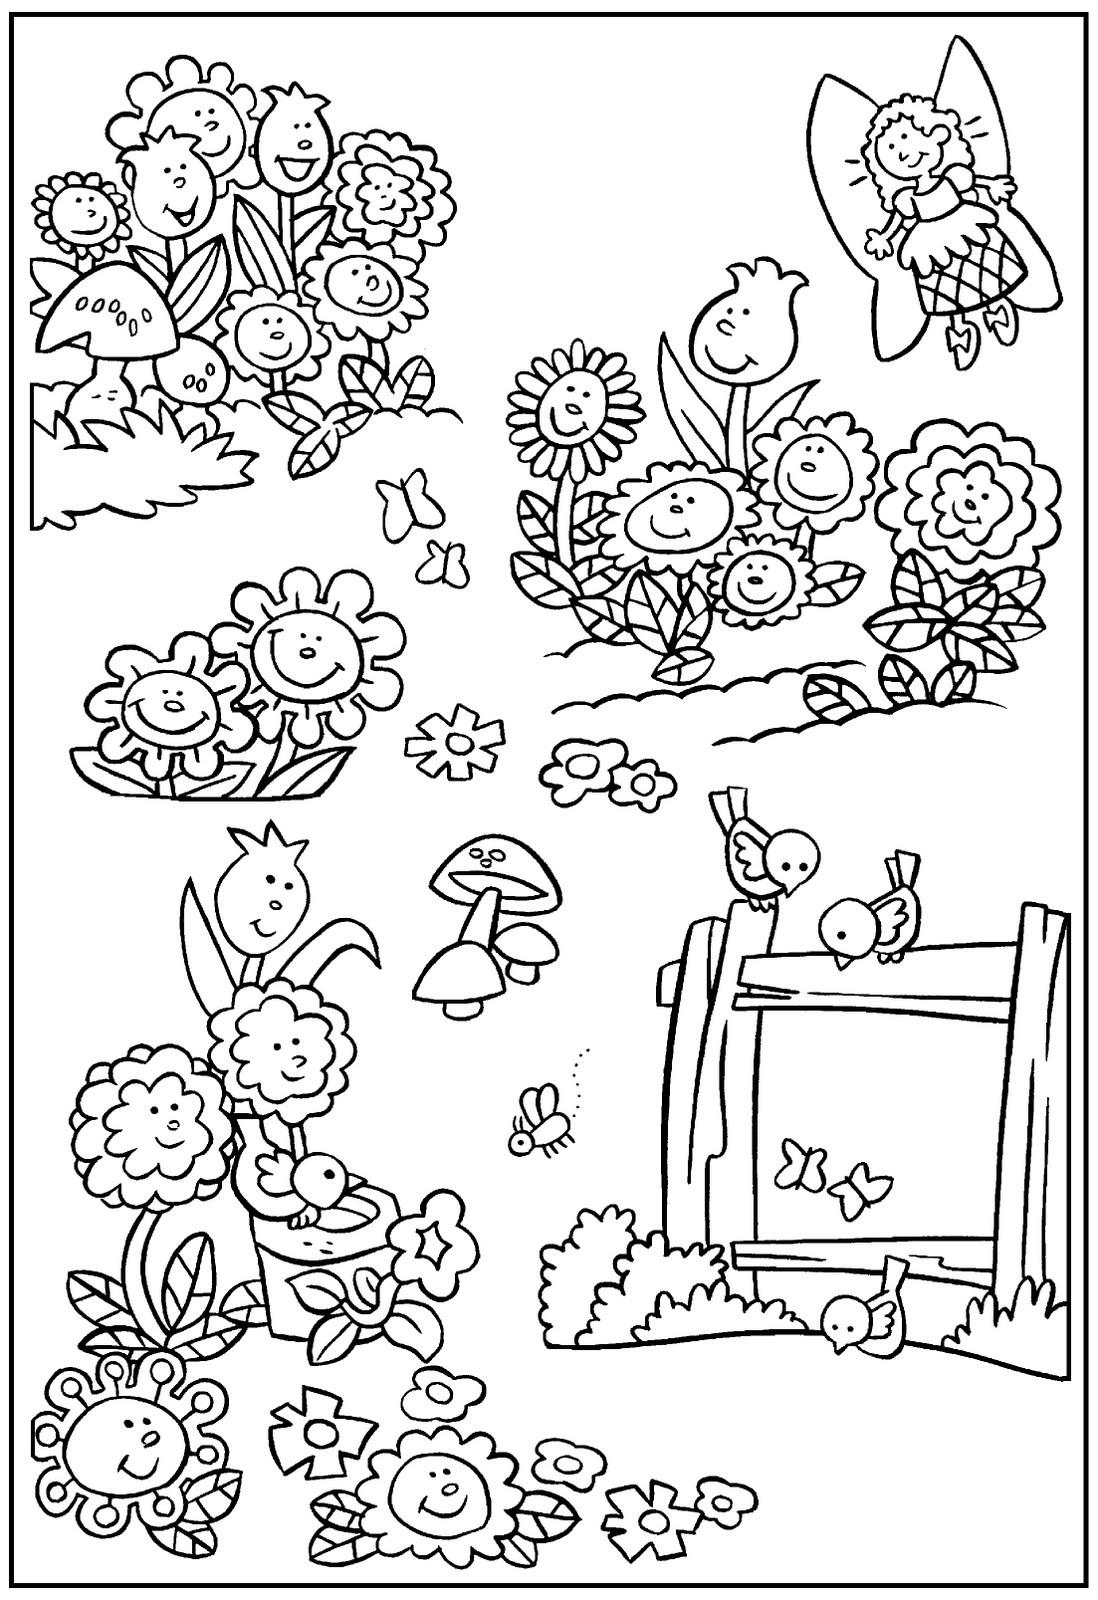 garden coloring sheet my little house anna and the flower garden coloring pages garden coloring sheet